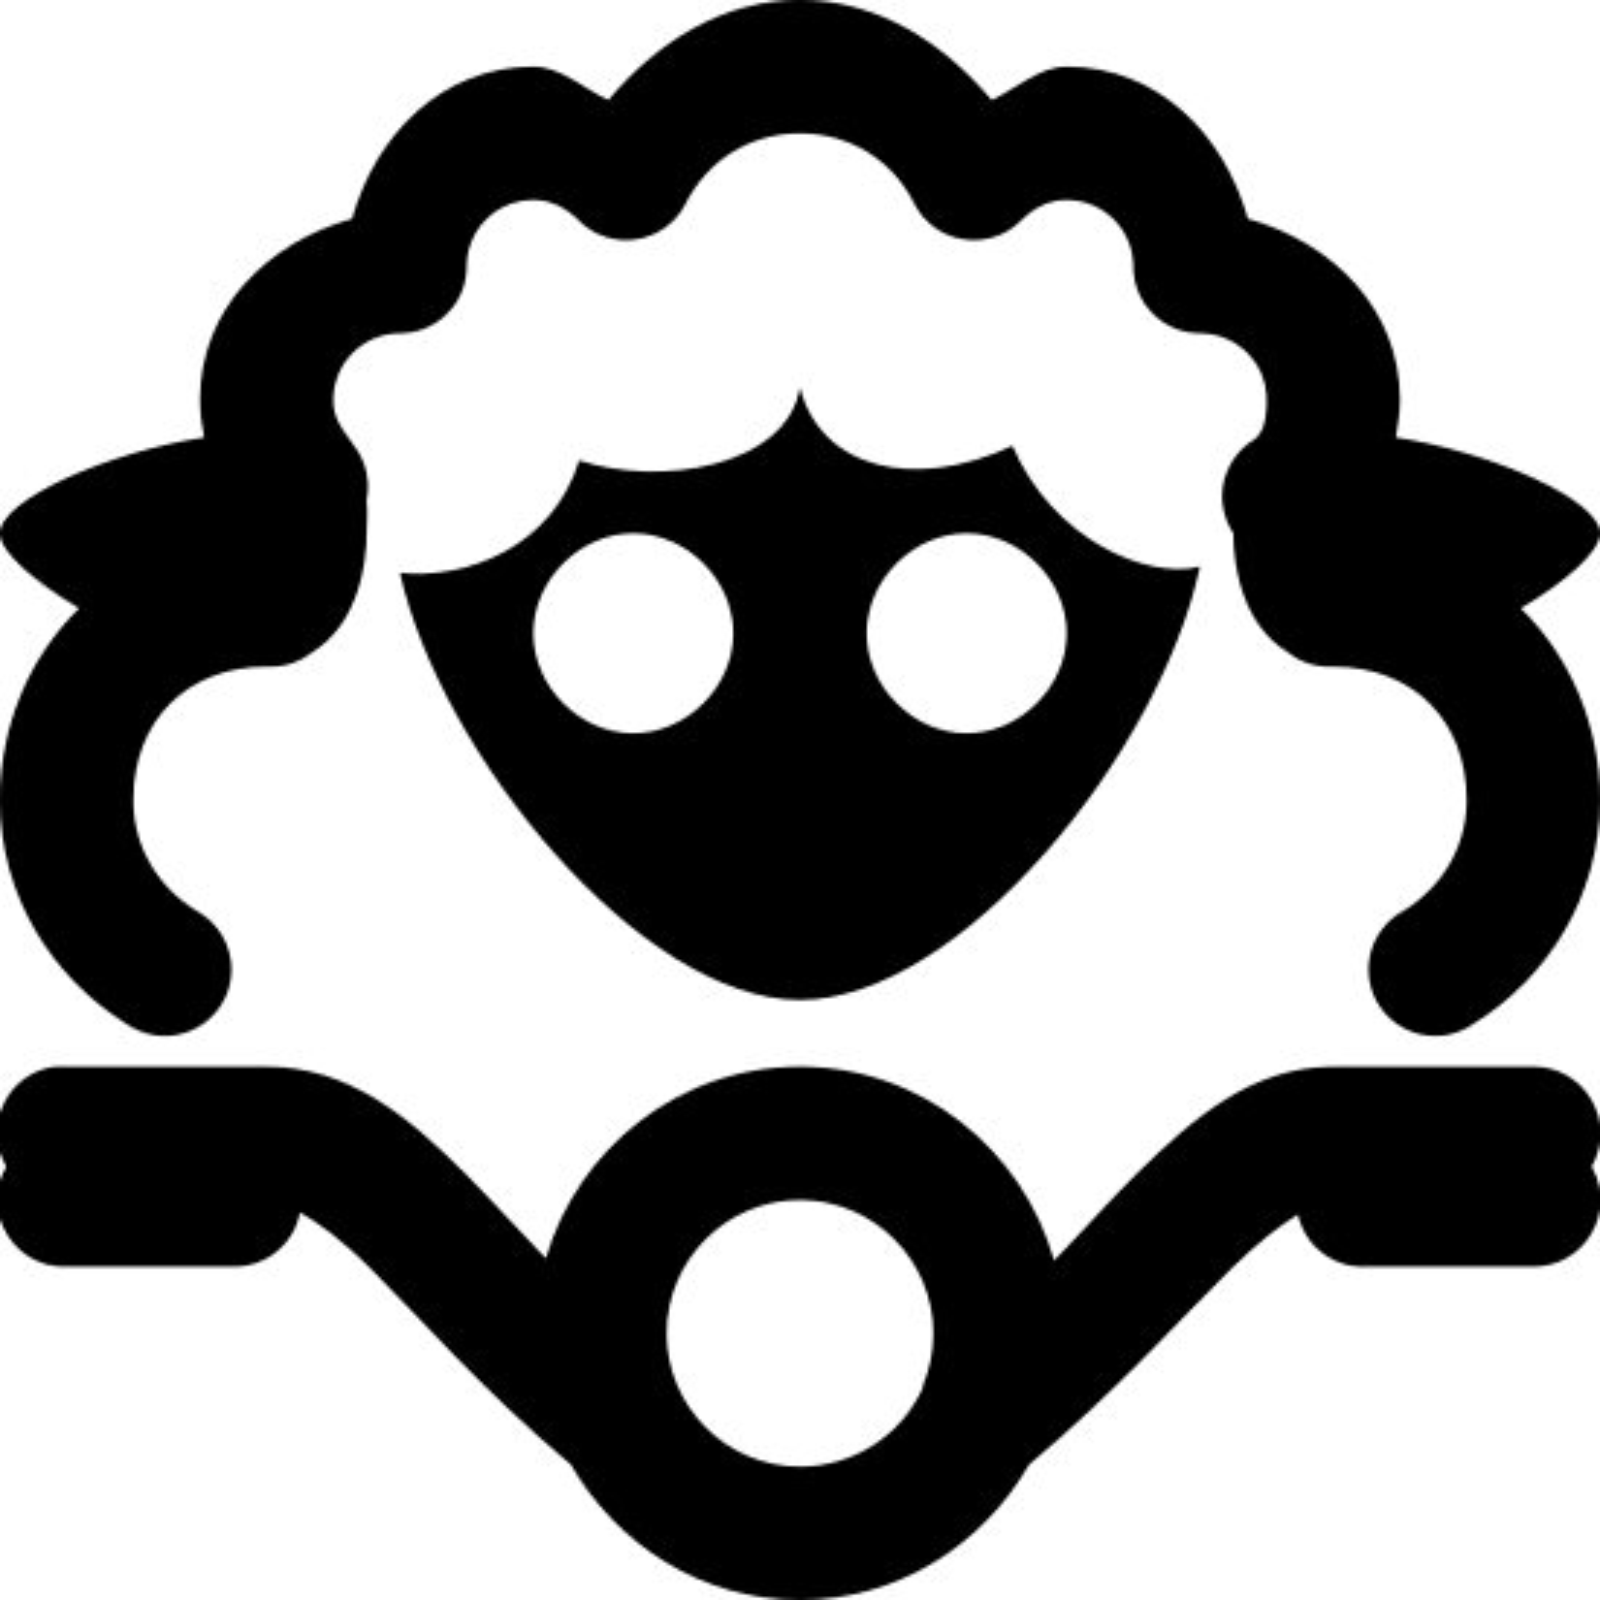 Sheep on Bike icon